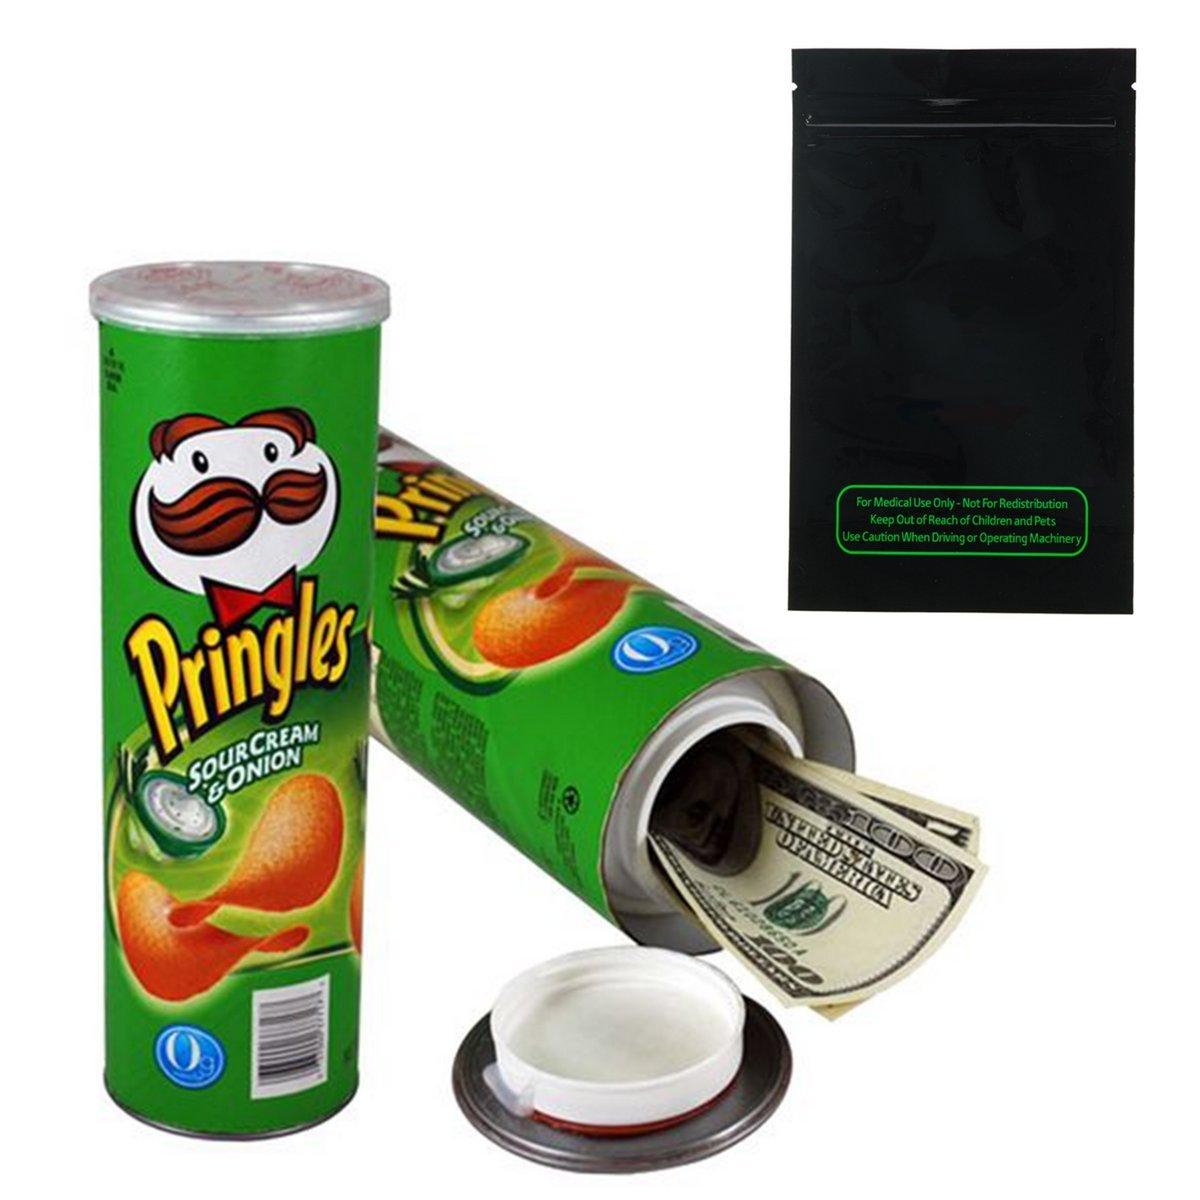 Pringles Stash Can Diversion Safe (Large, Sour Cream & Onion)